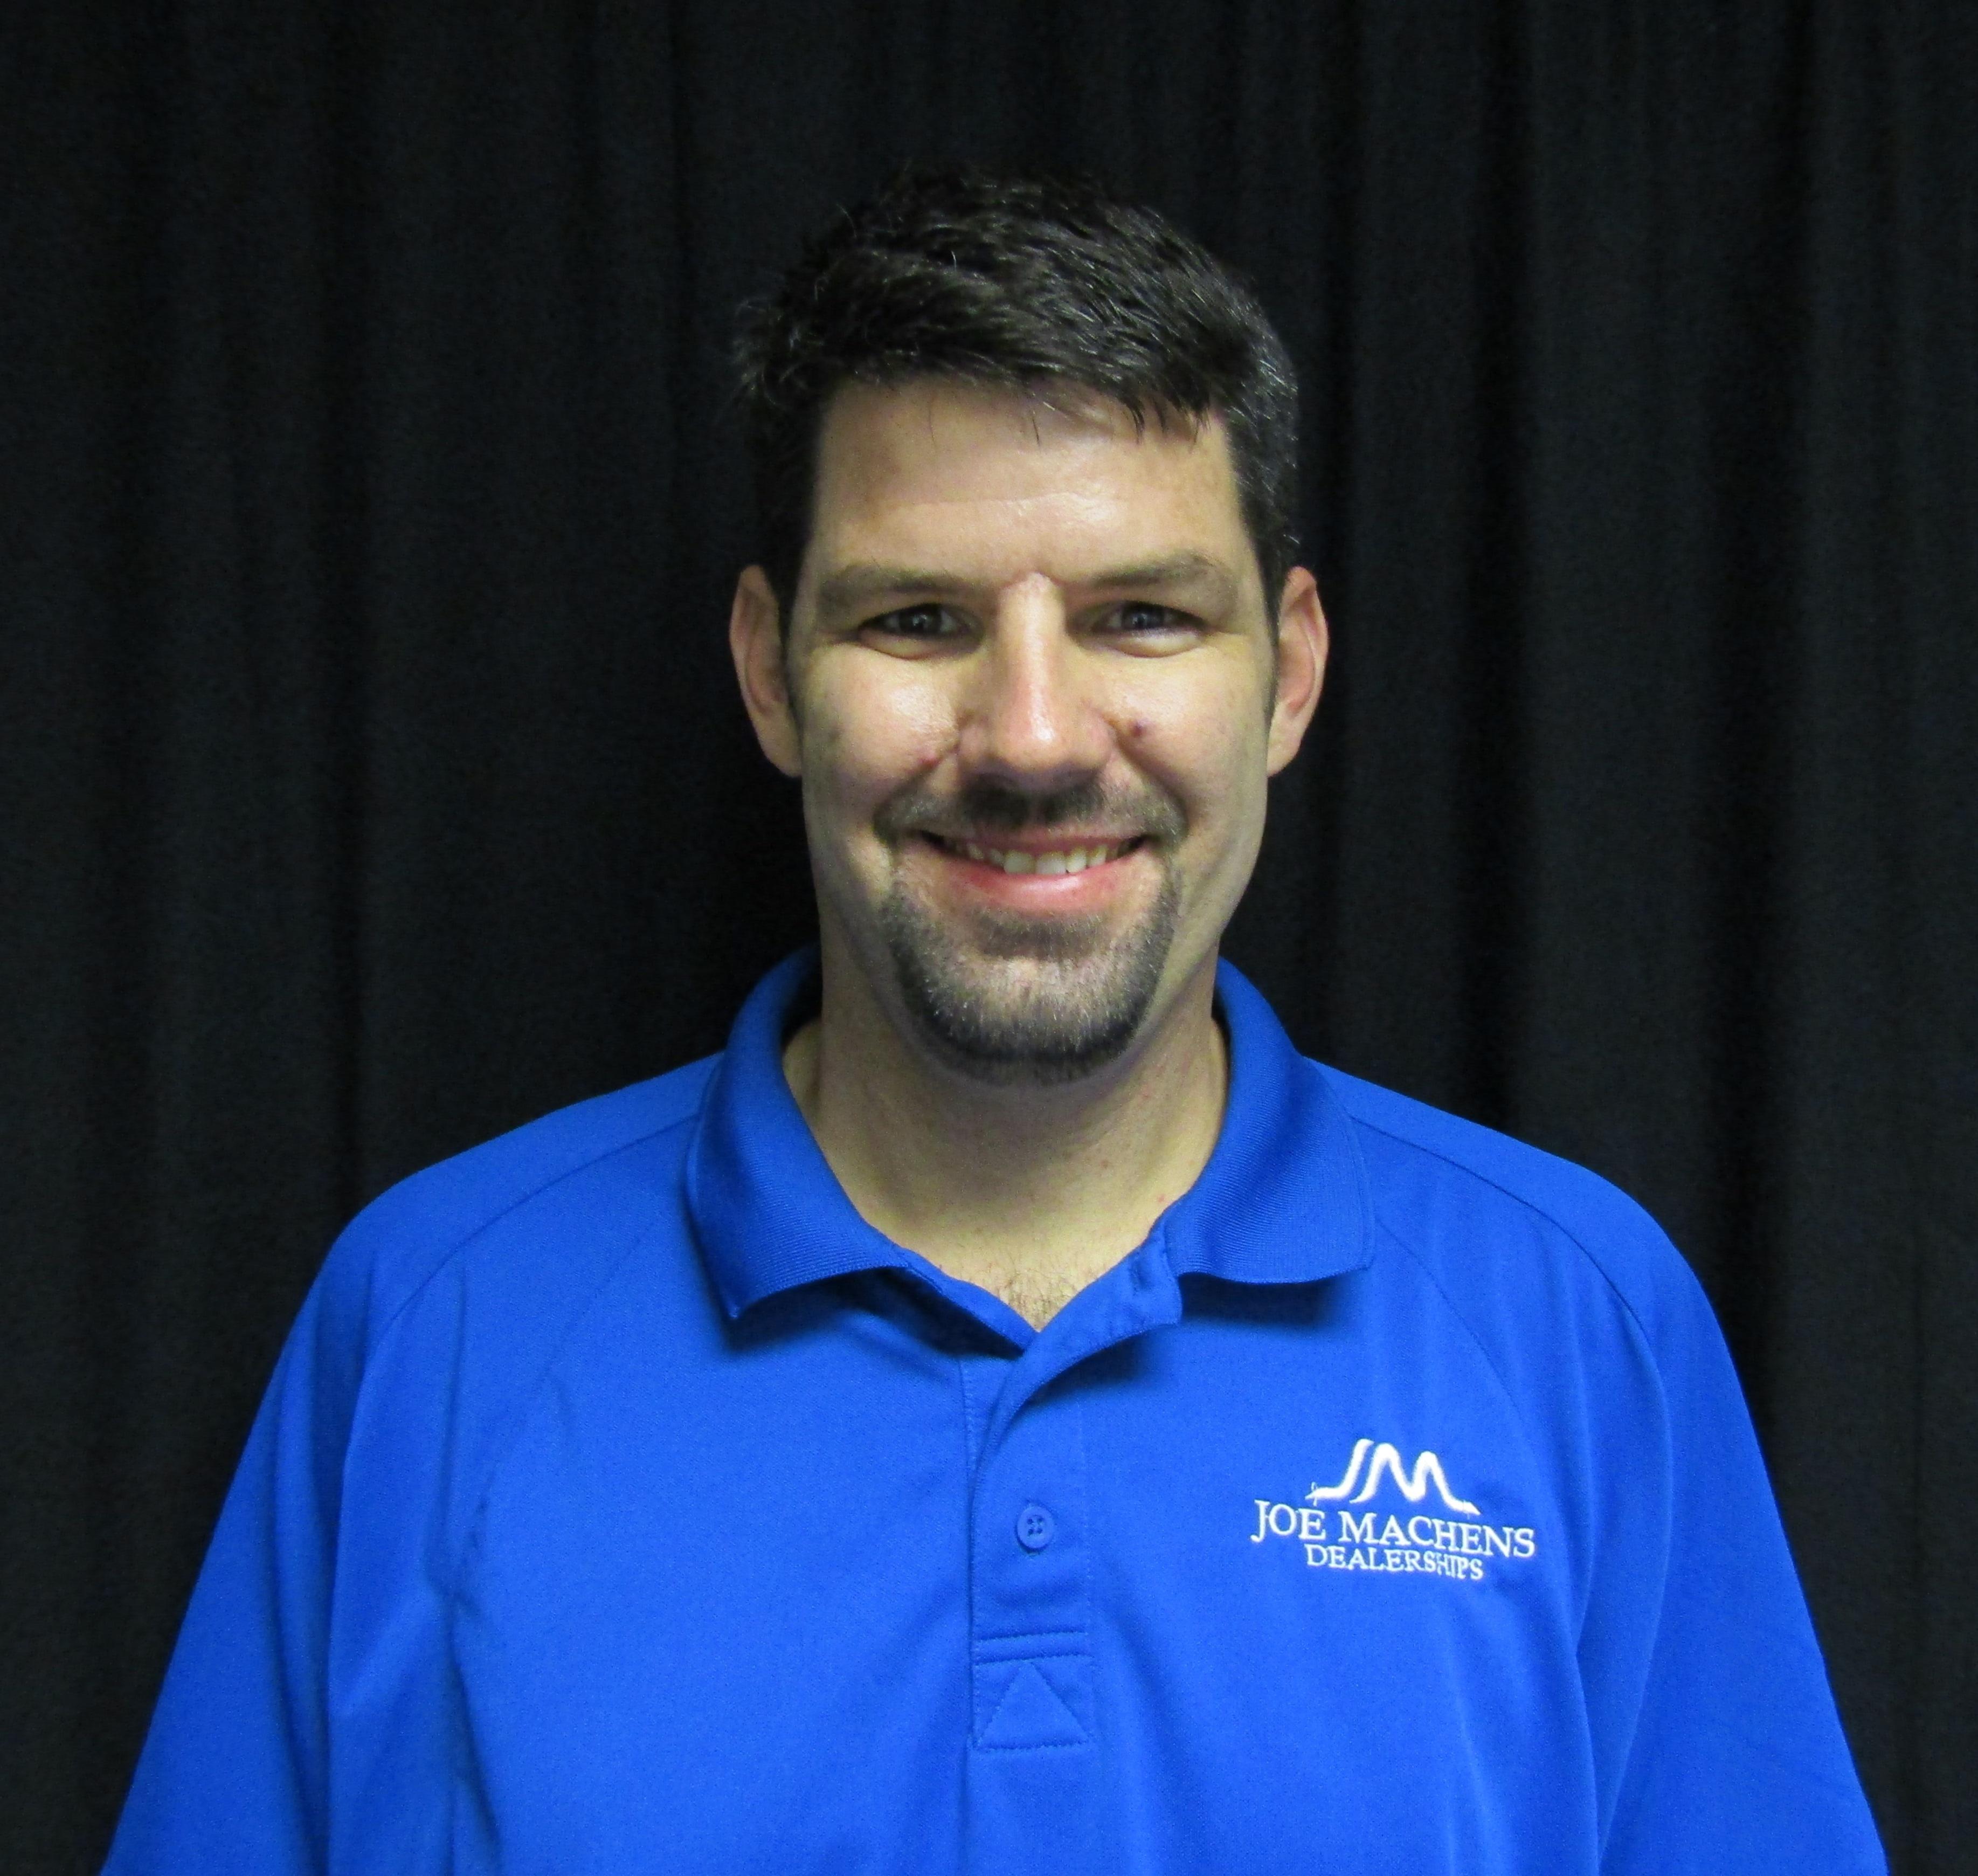 Joe Machens Columbia Mo >> Service and Maintenance | Ford Service | Joe Machens Ford